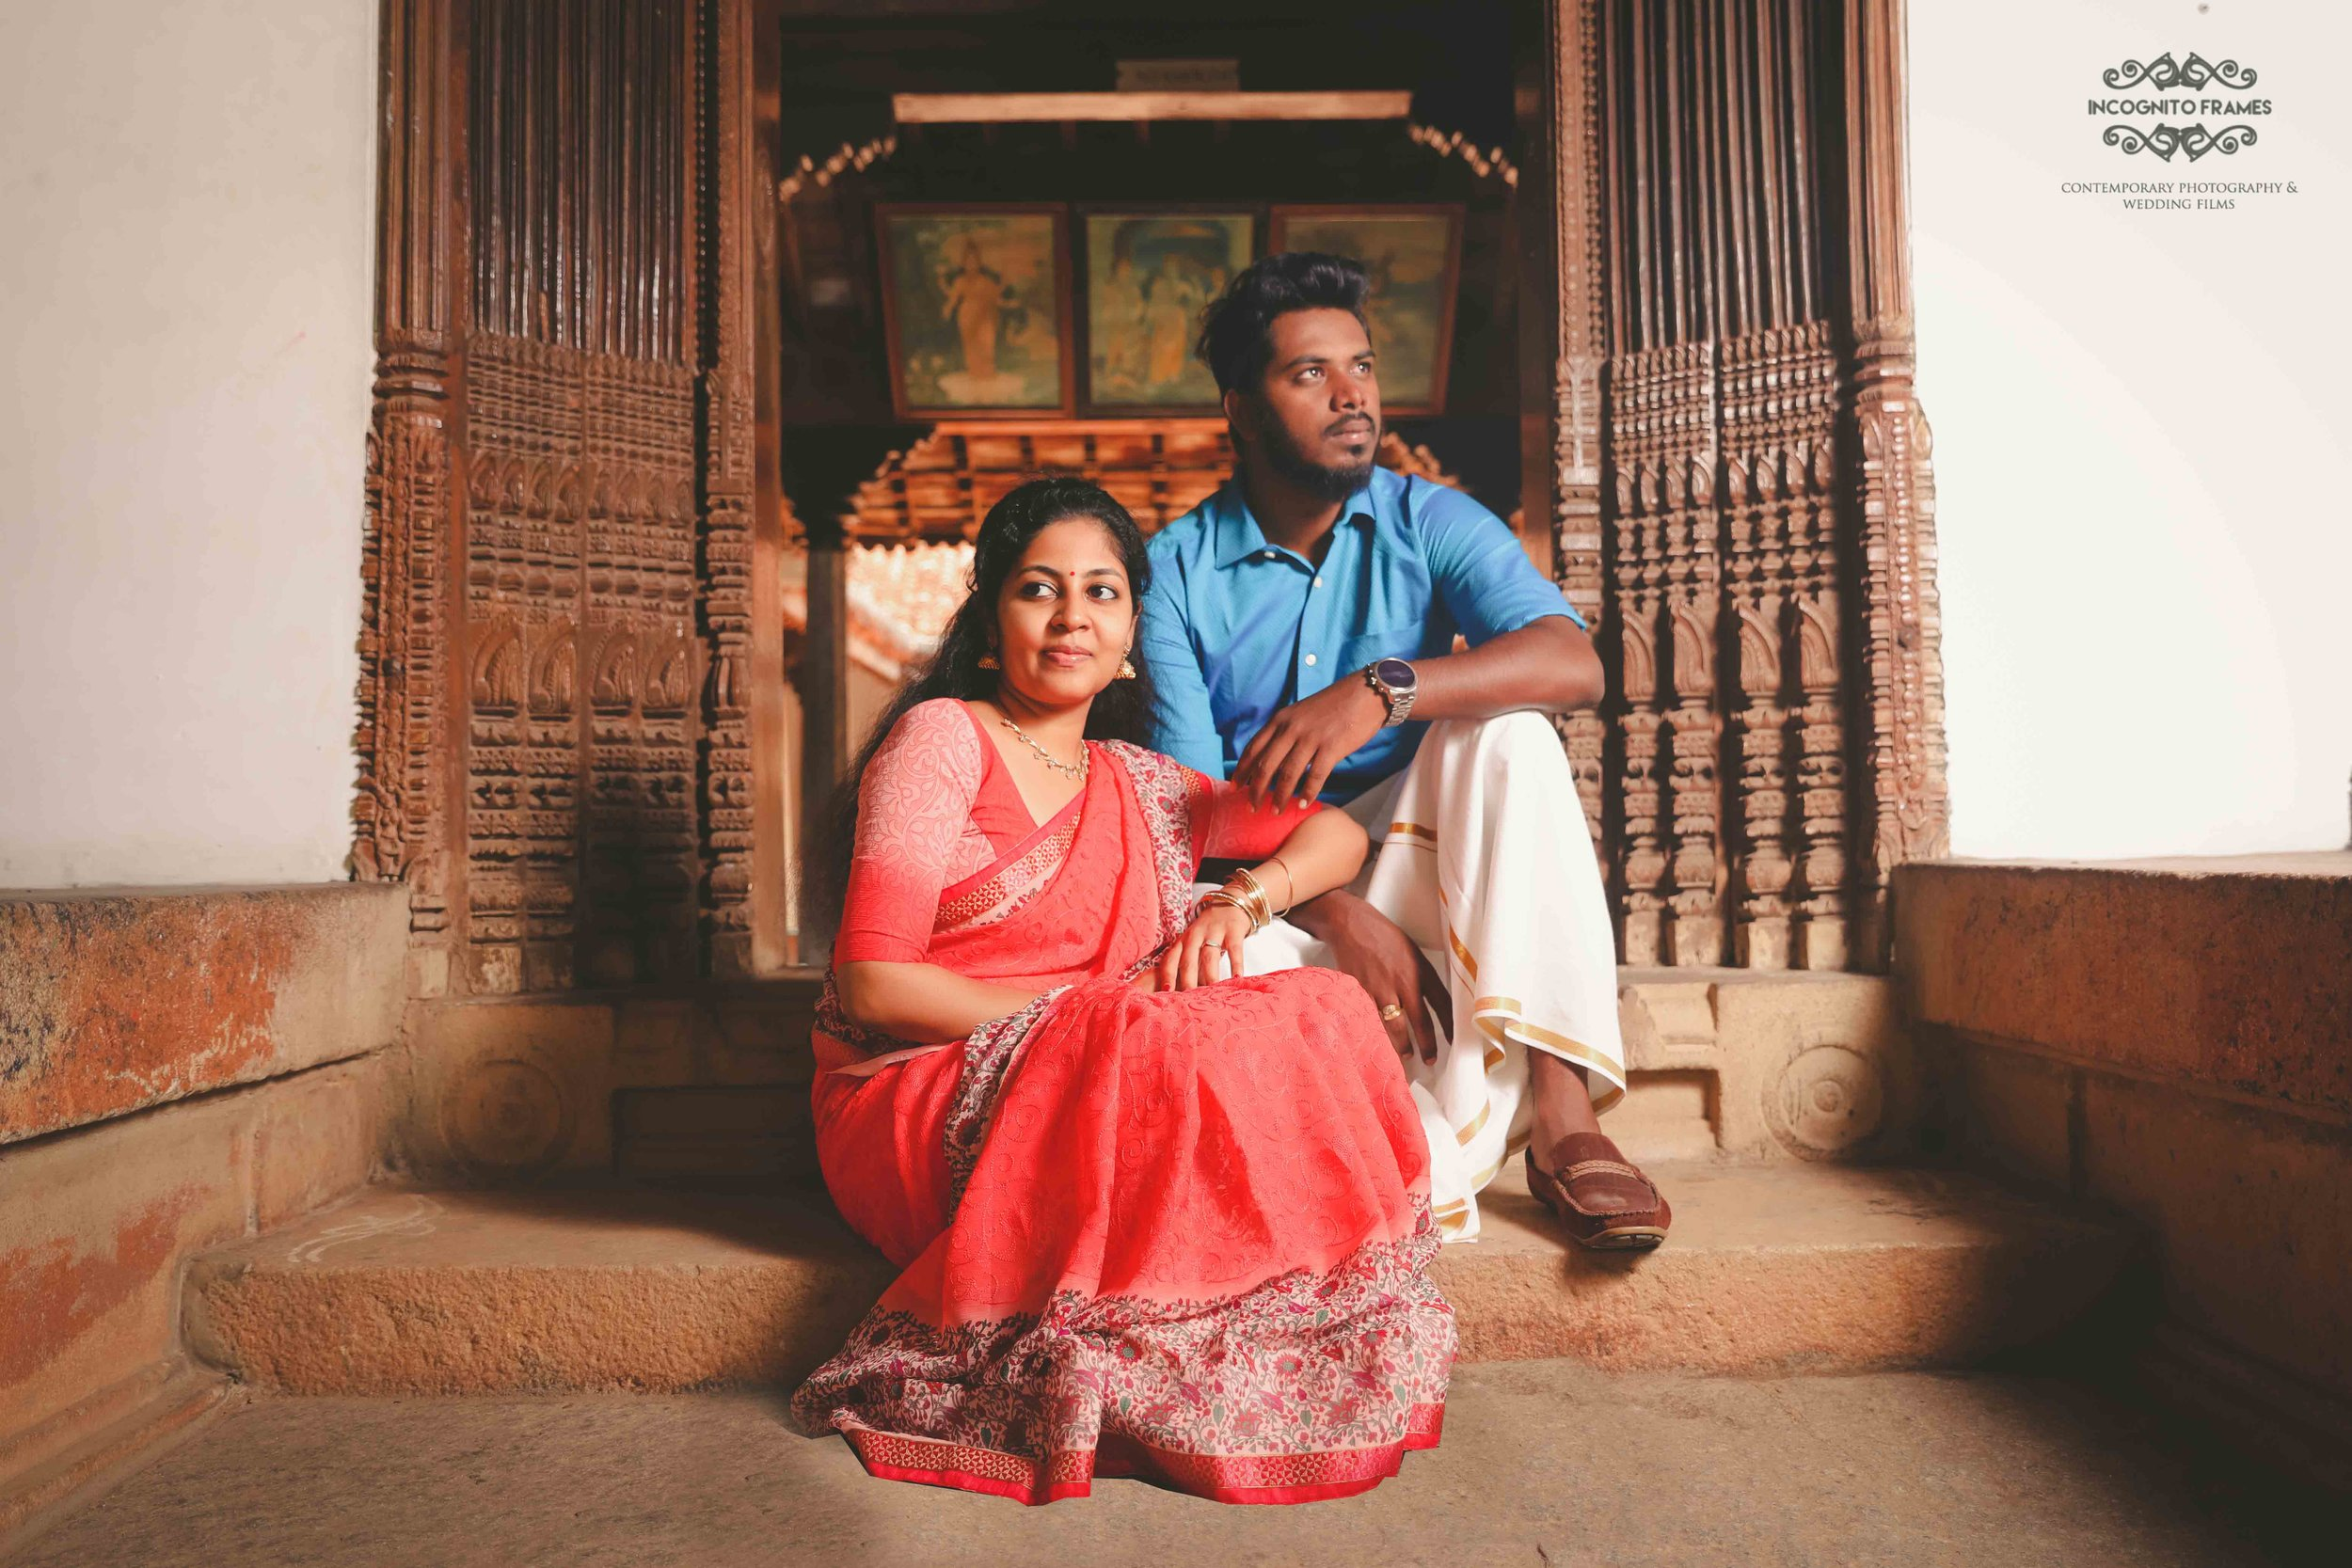 dakshin-chithra-coupleshoot.jpg